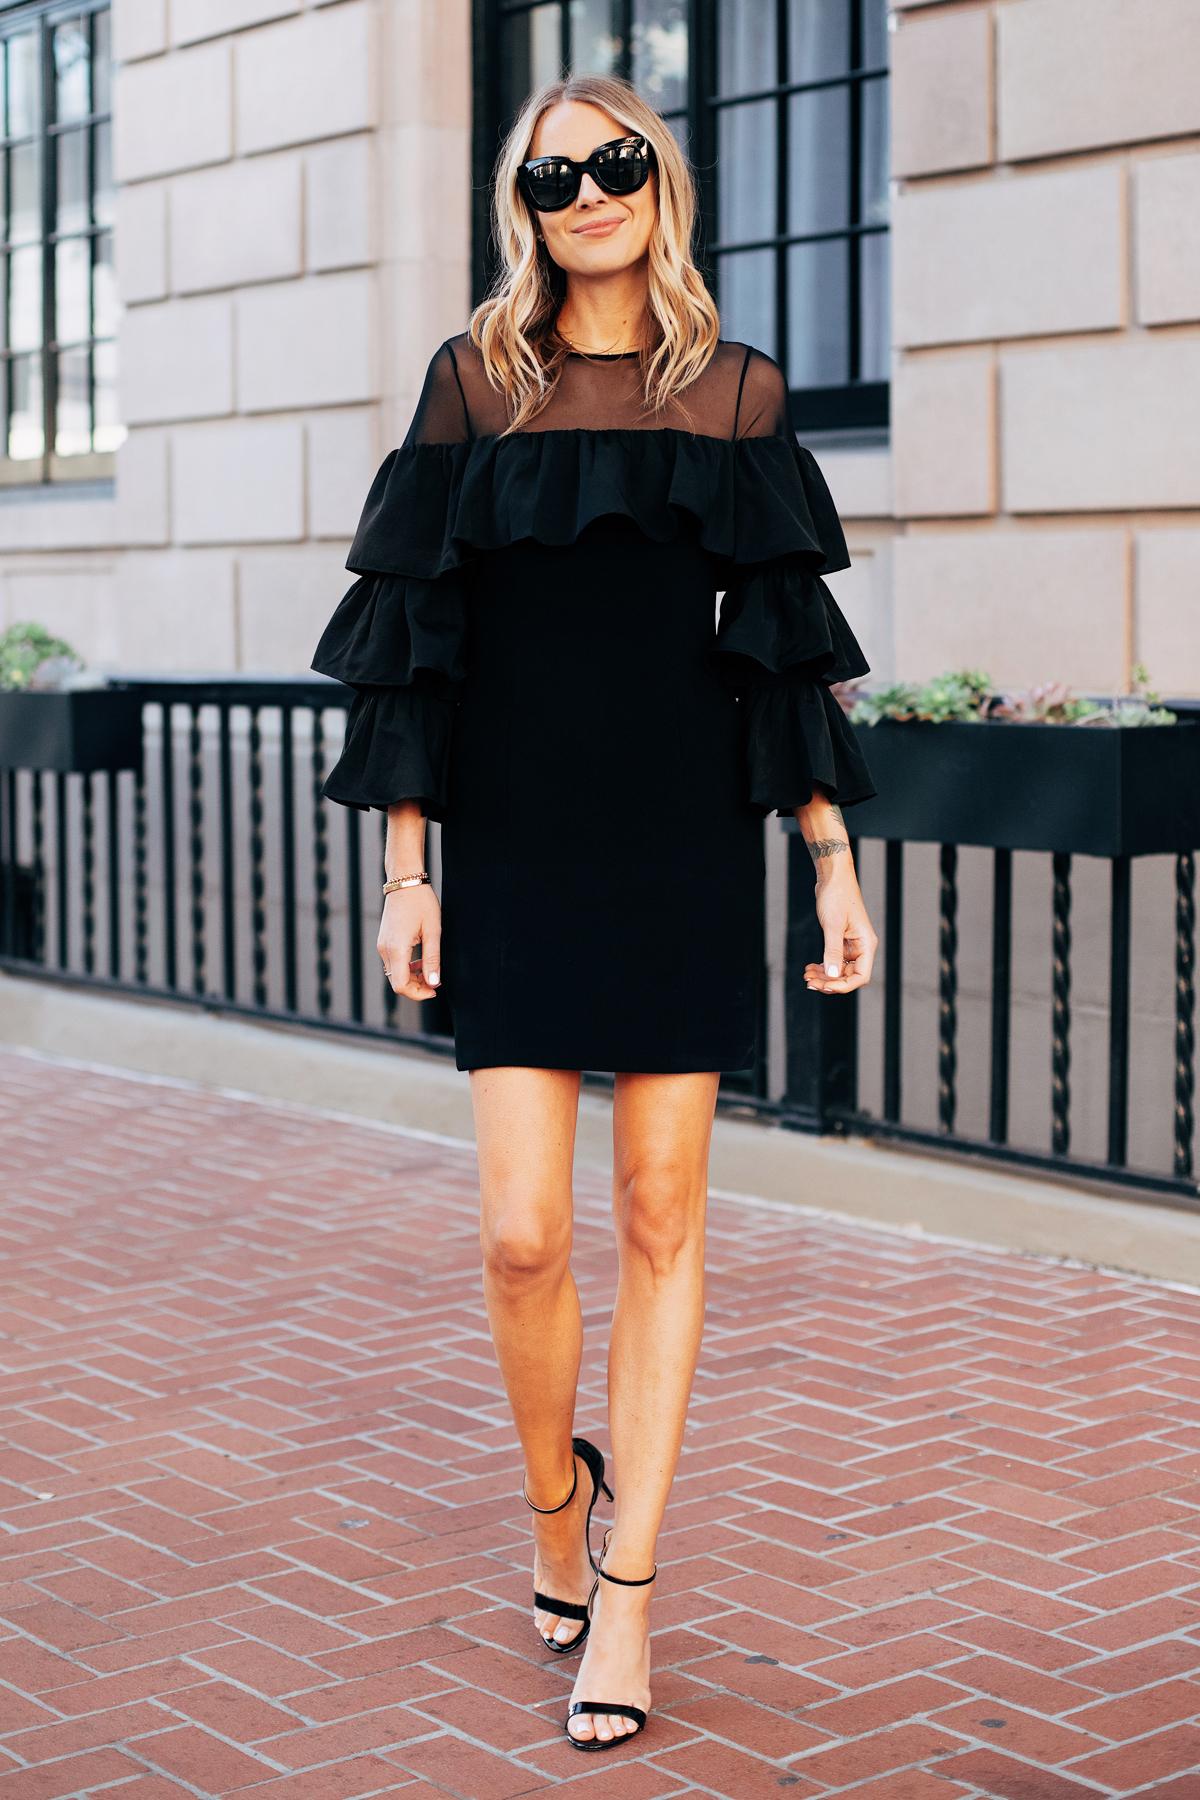 Fashion Jackson Wearing Black Tiered Holiday Dress Black Heeled Sandals 3